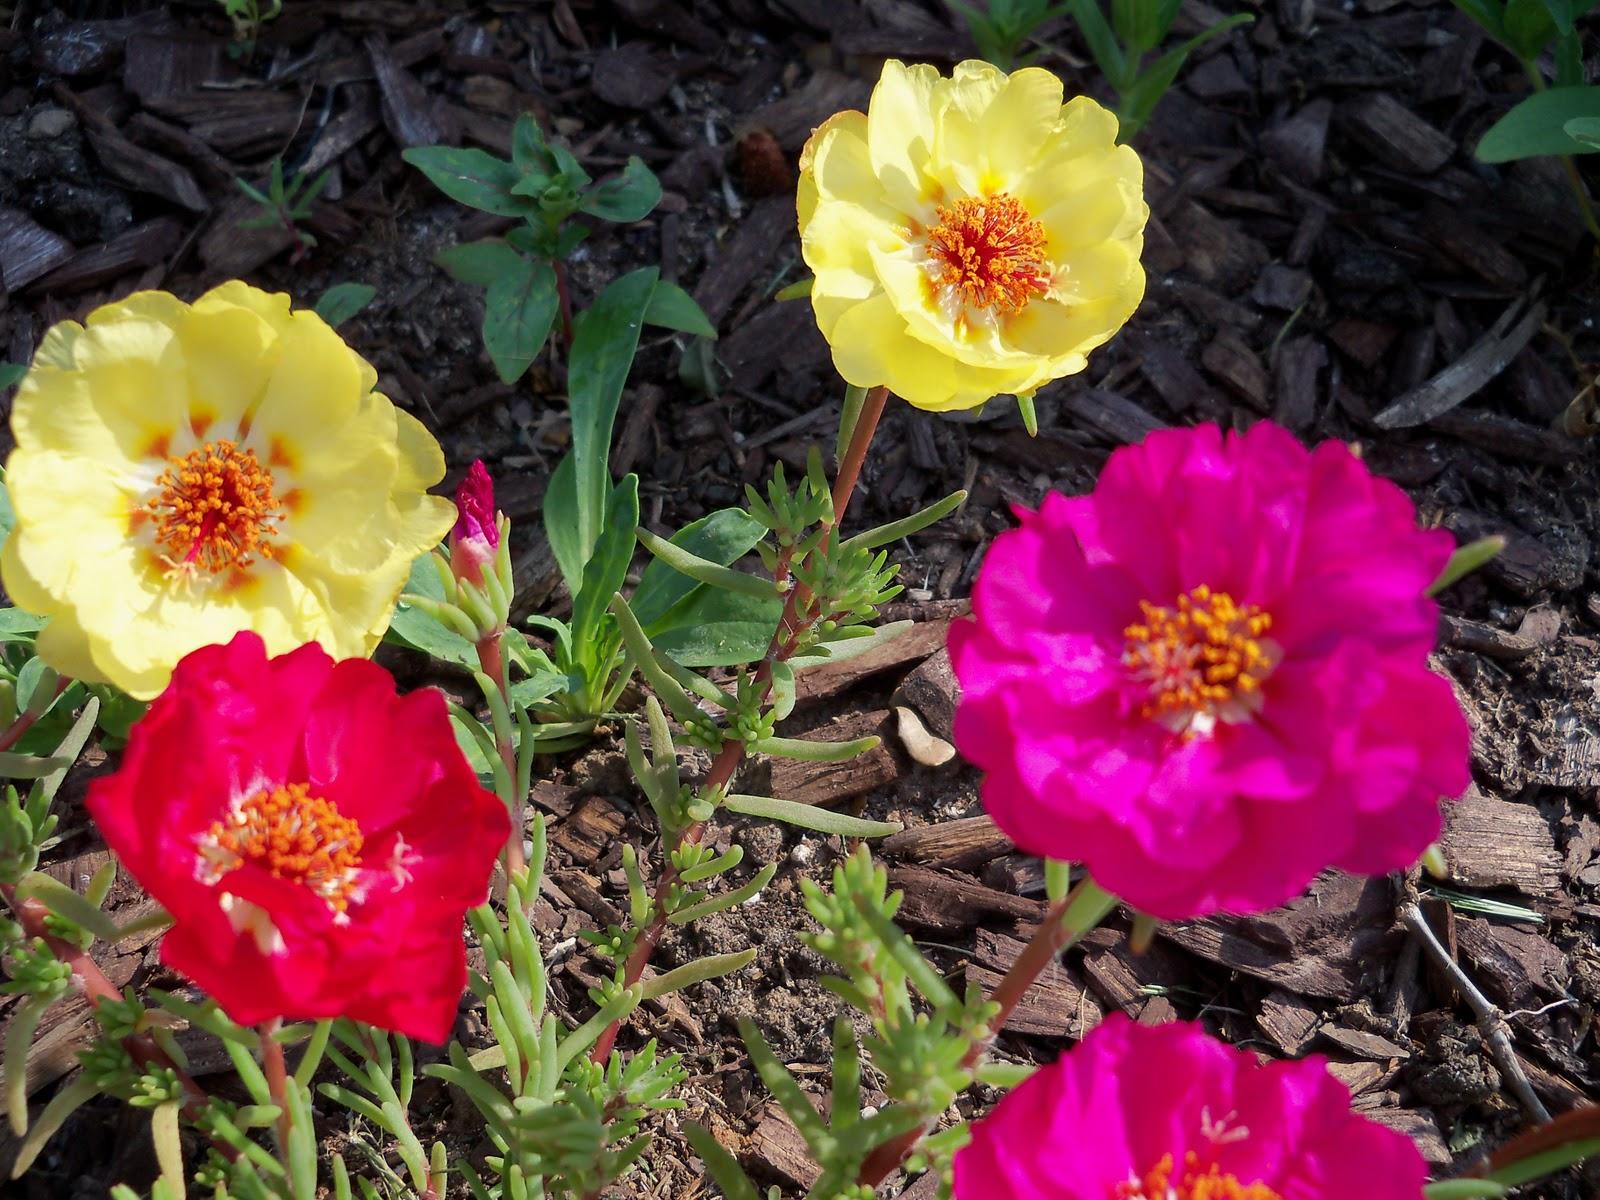 Gardening 2010, Part Two - 101_1848.JPG